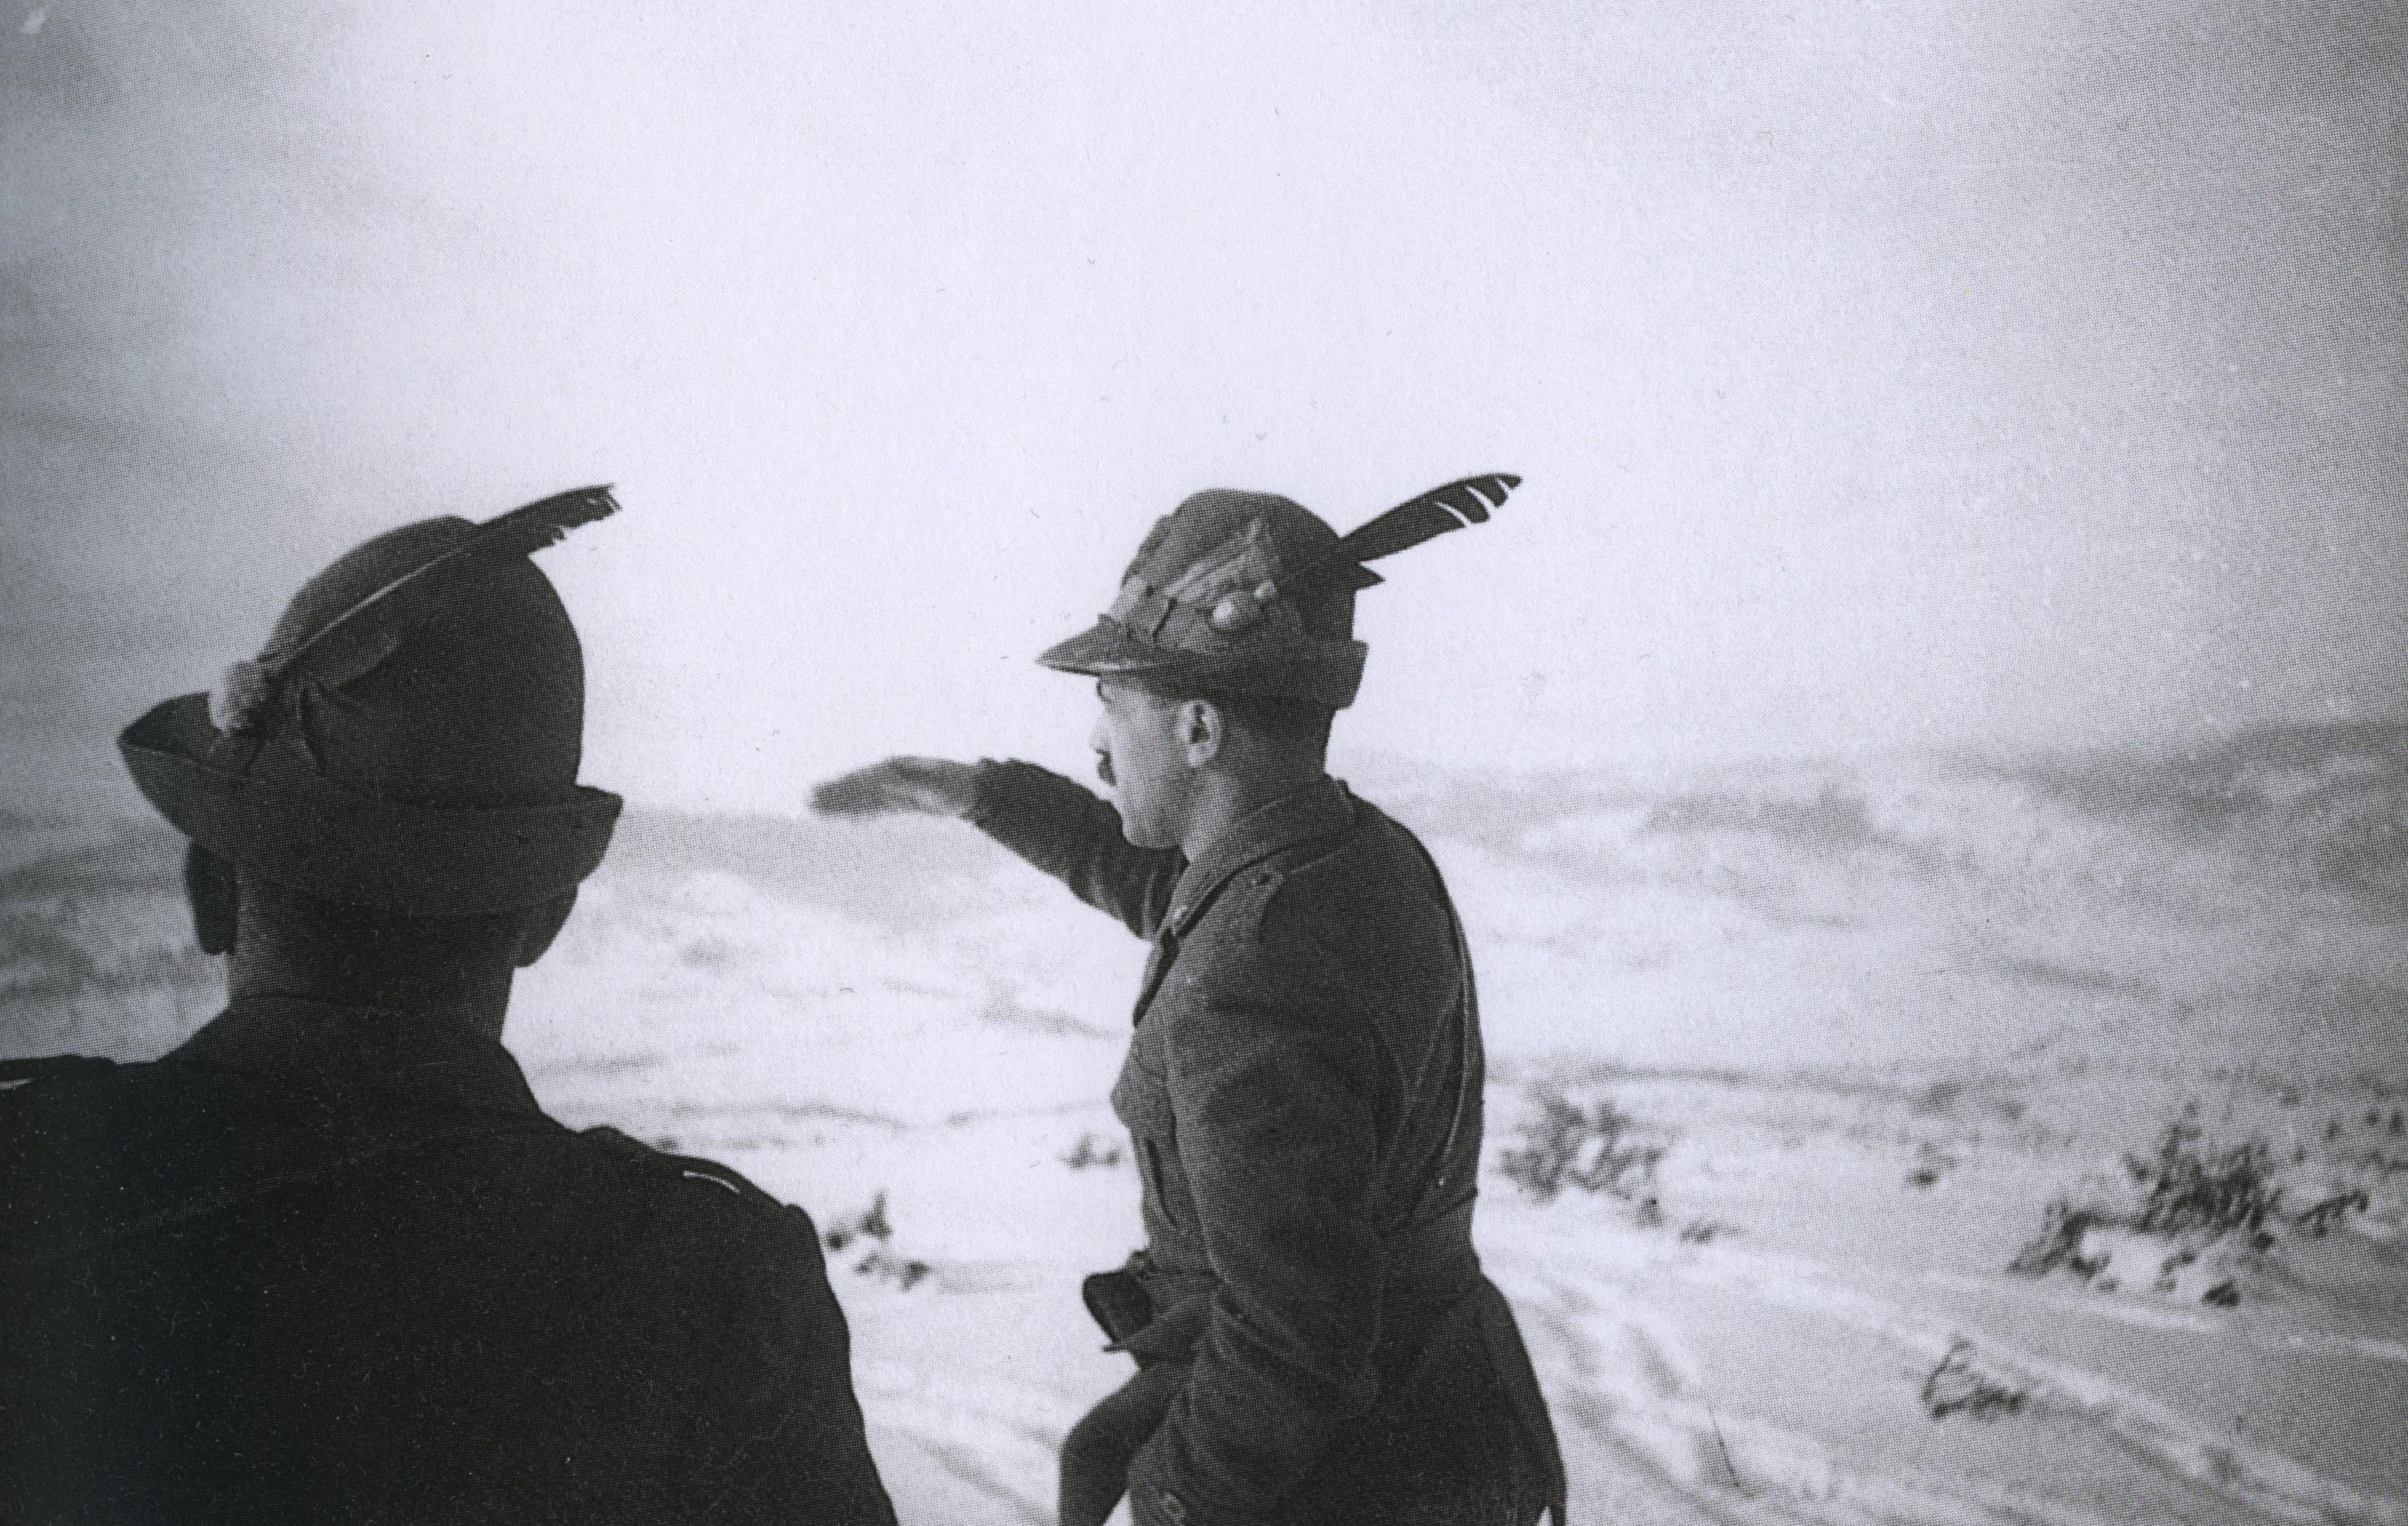 ettore sottsass_guerre_monténégro, 1943_p13